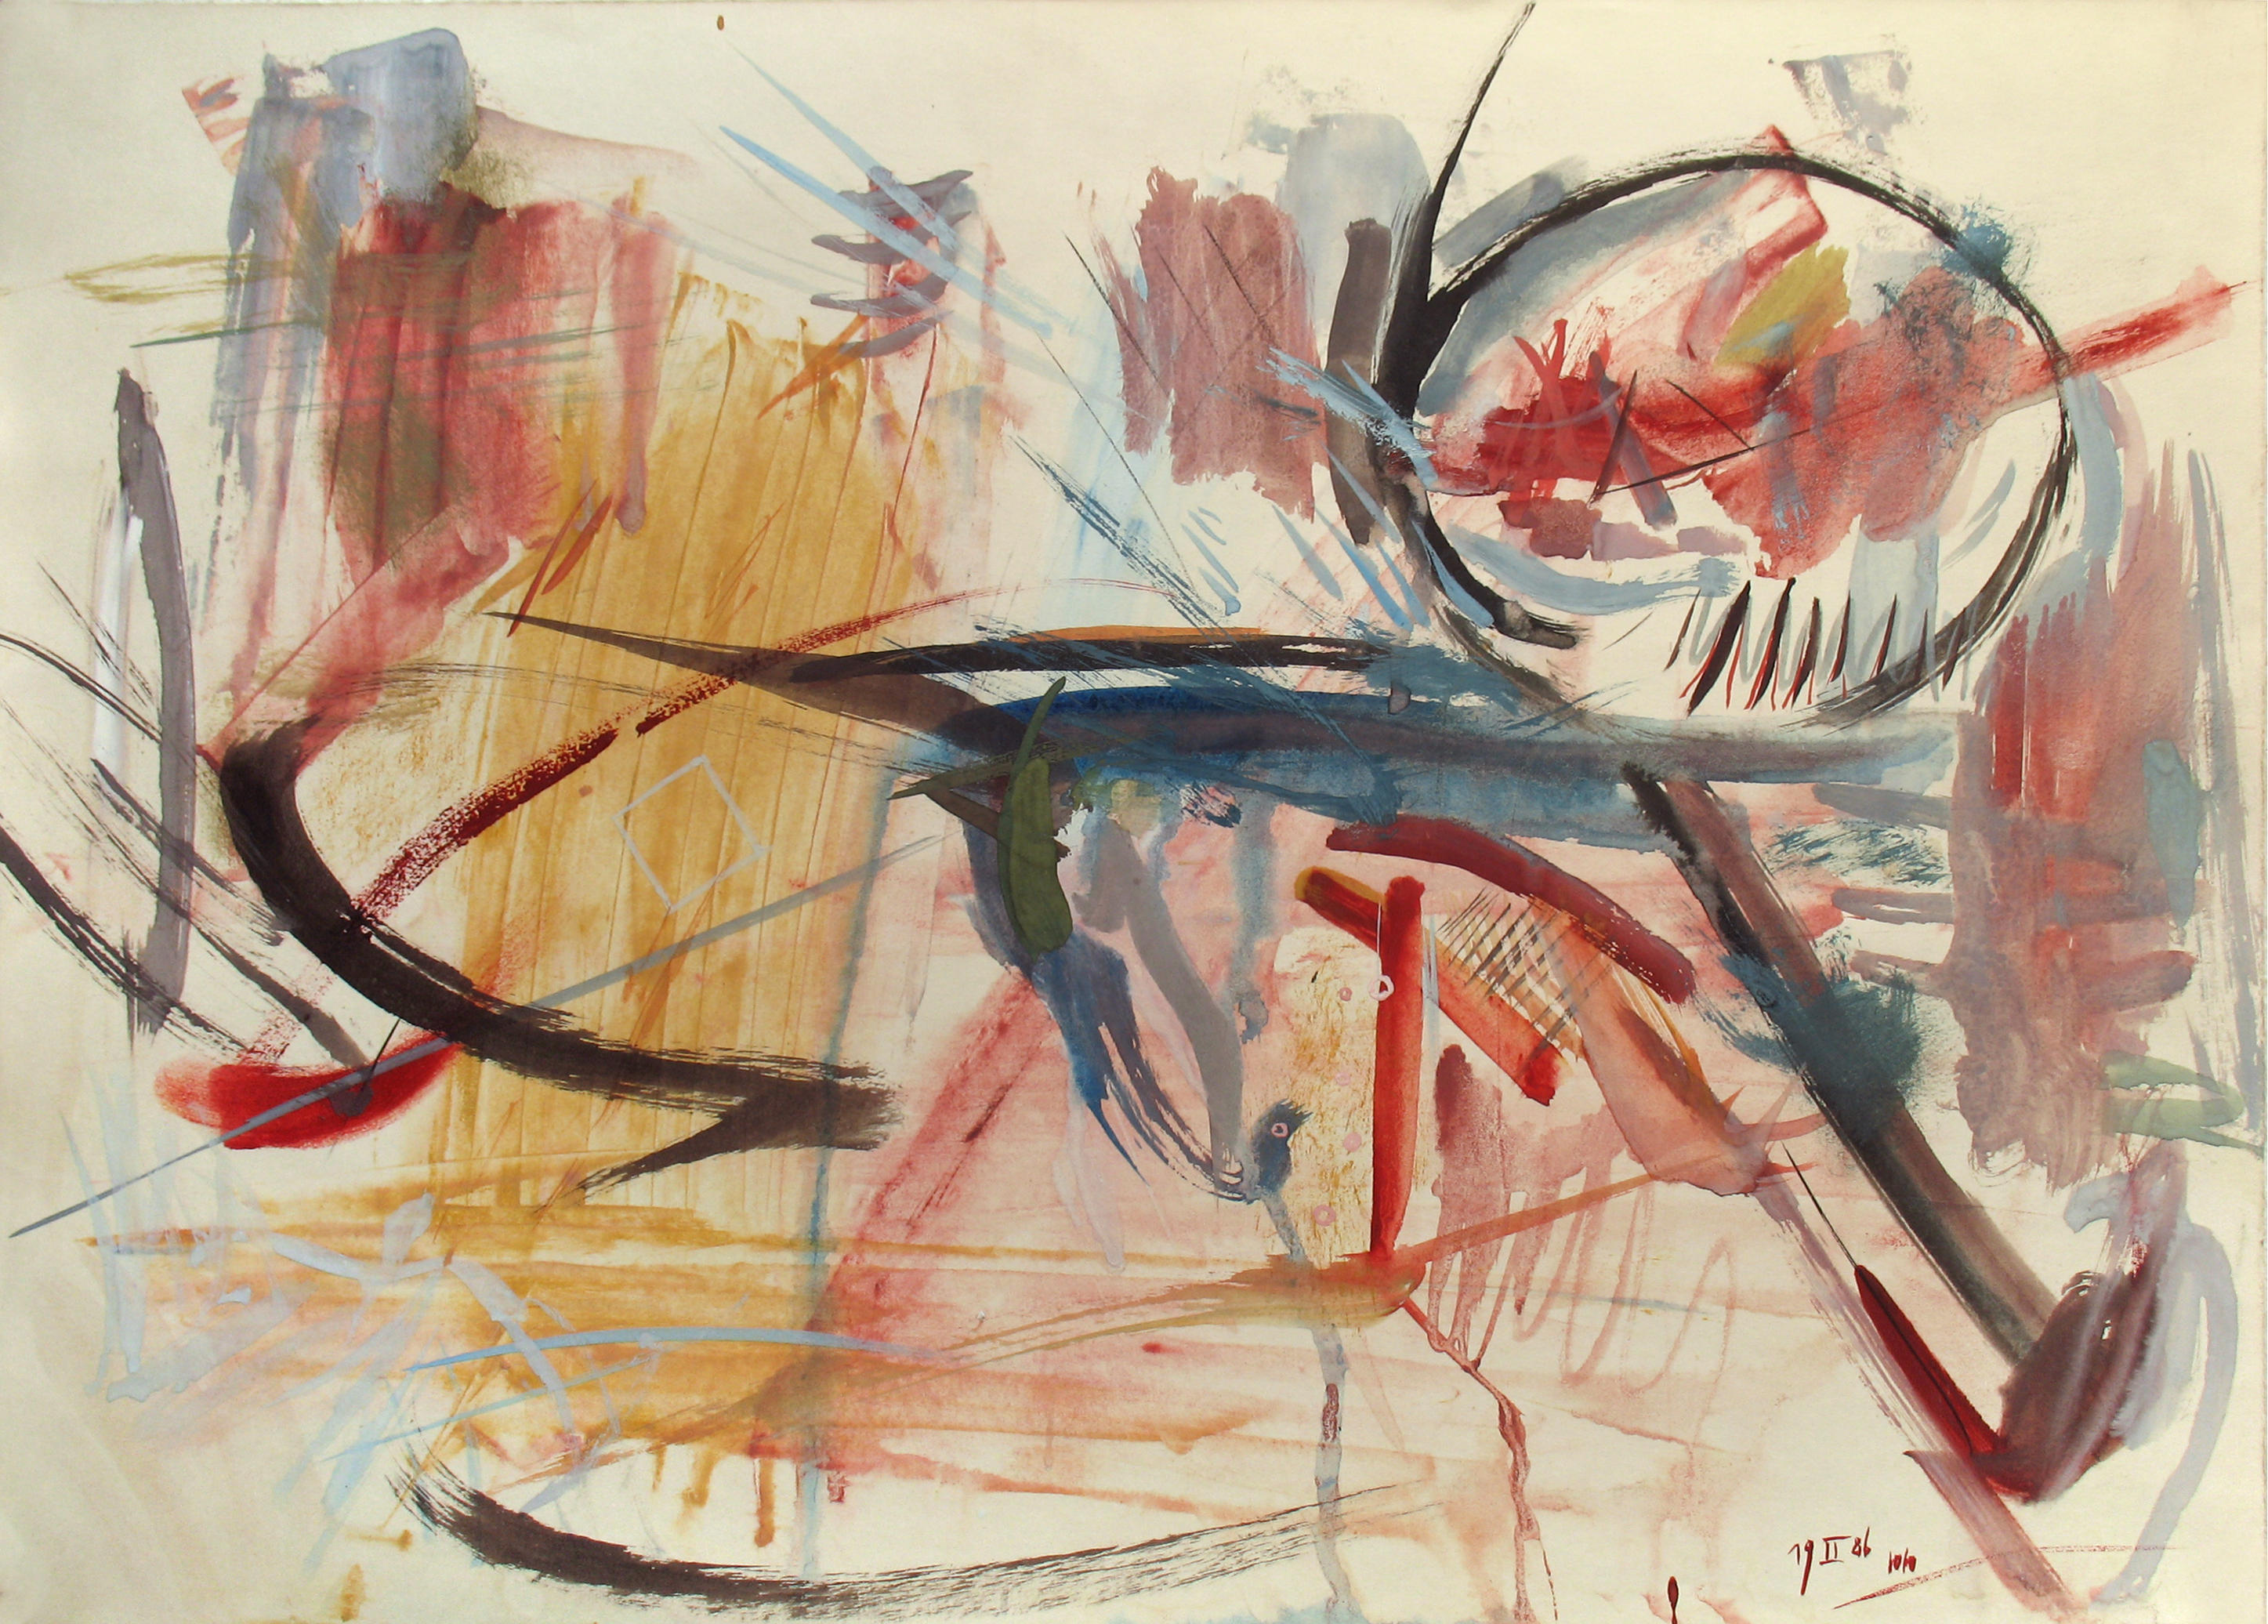 Untitled. 1986 by Yudaev